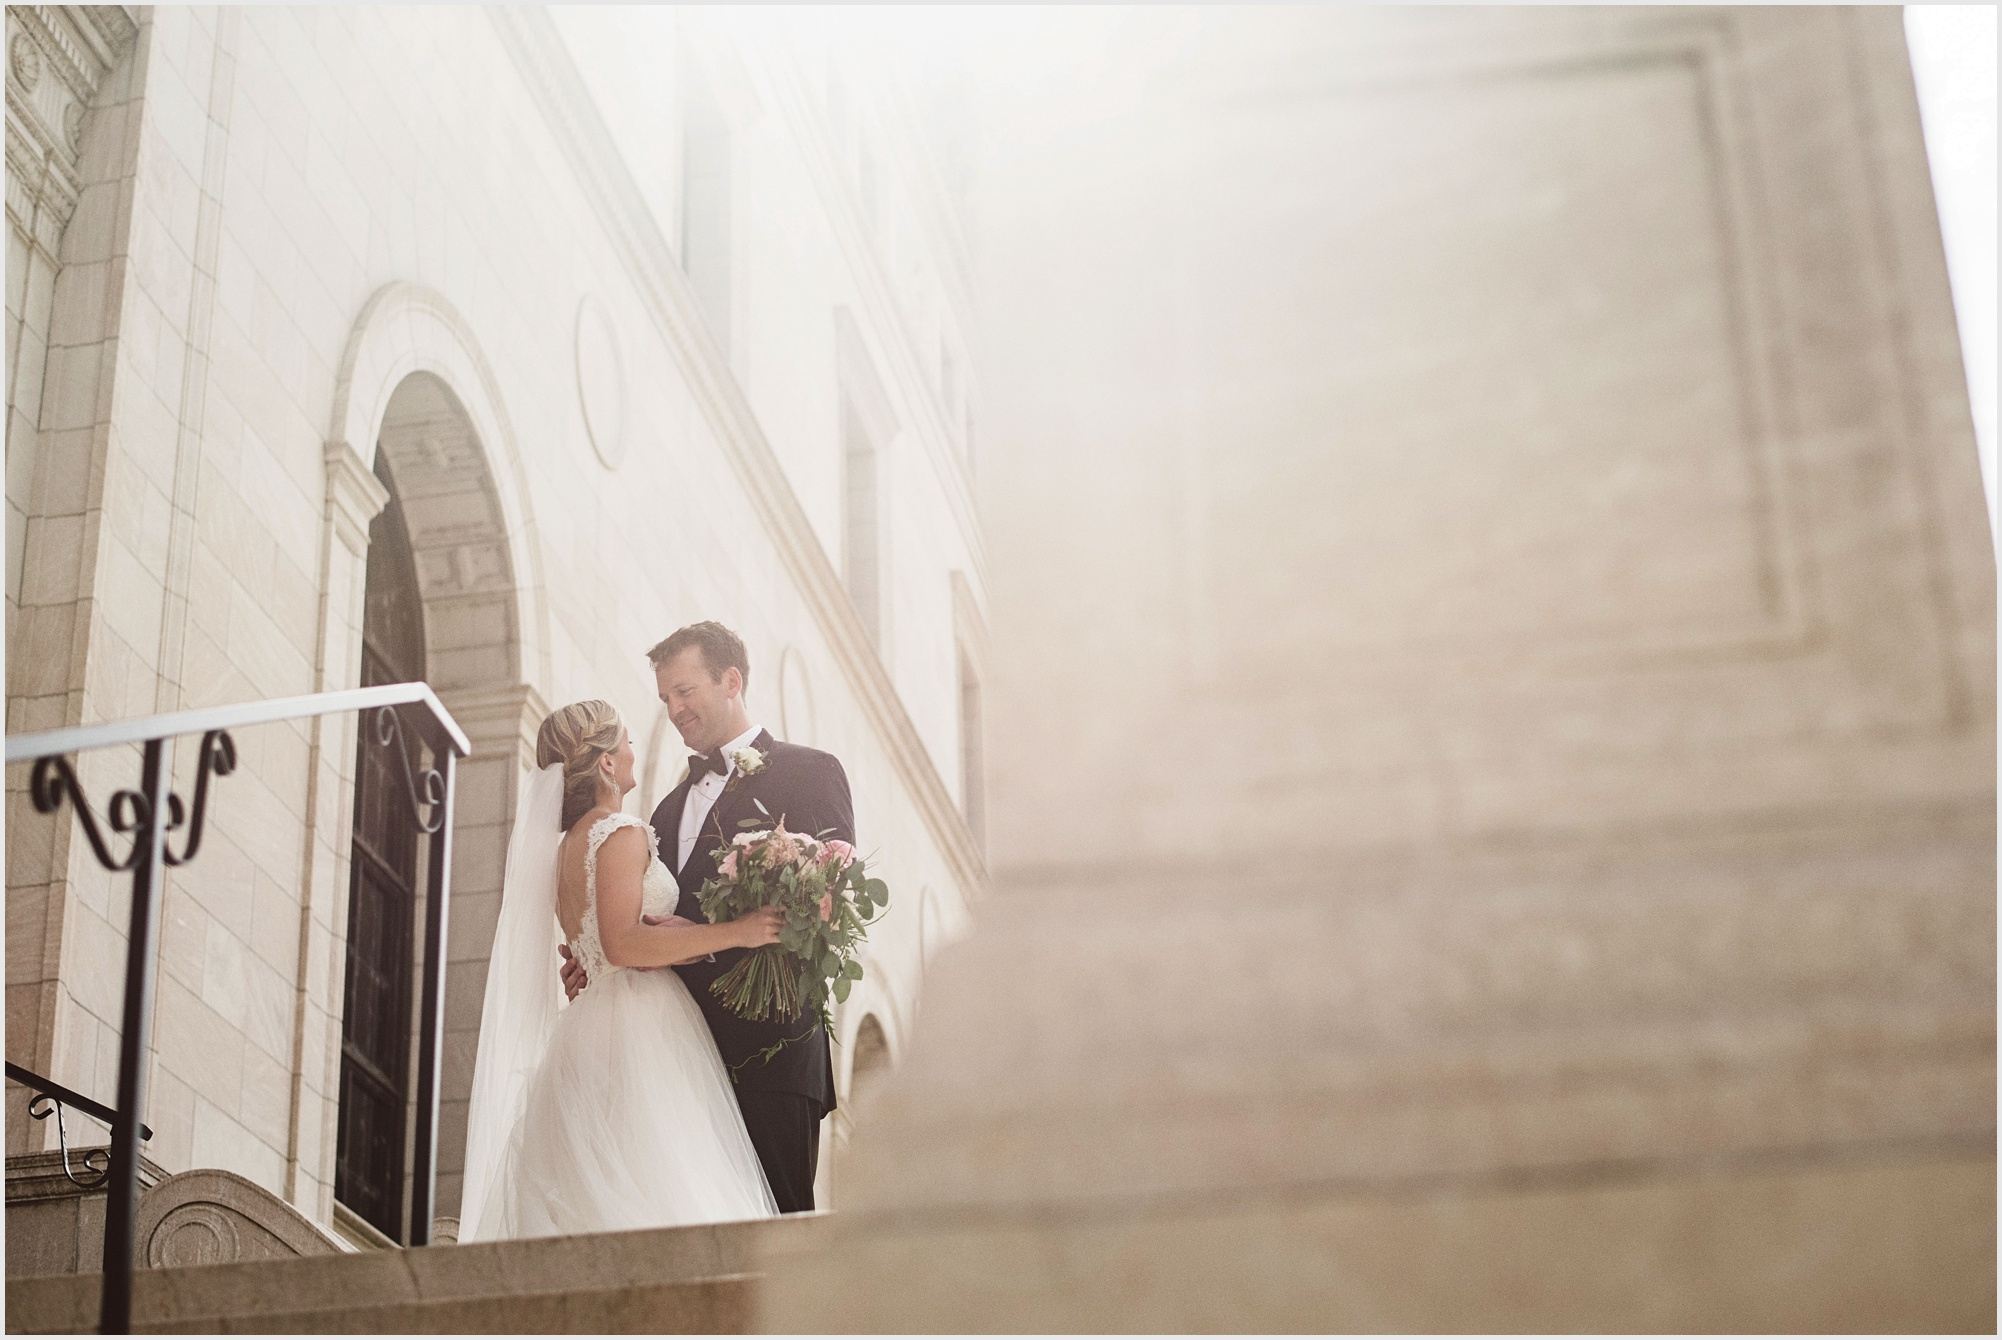 maura_david_james_j_hill_wedding_lucas_botz_photography_032.jpg